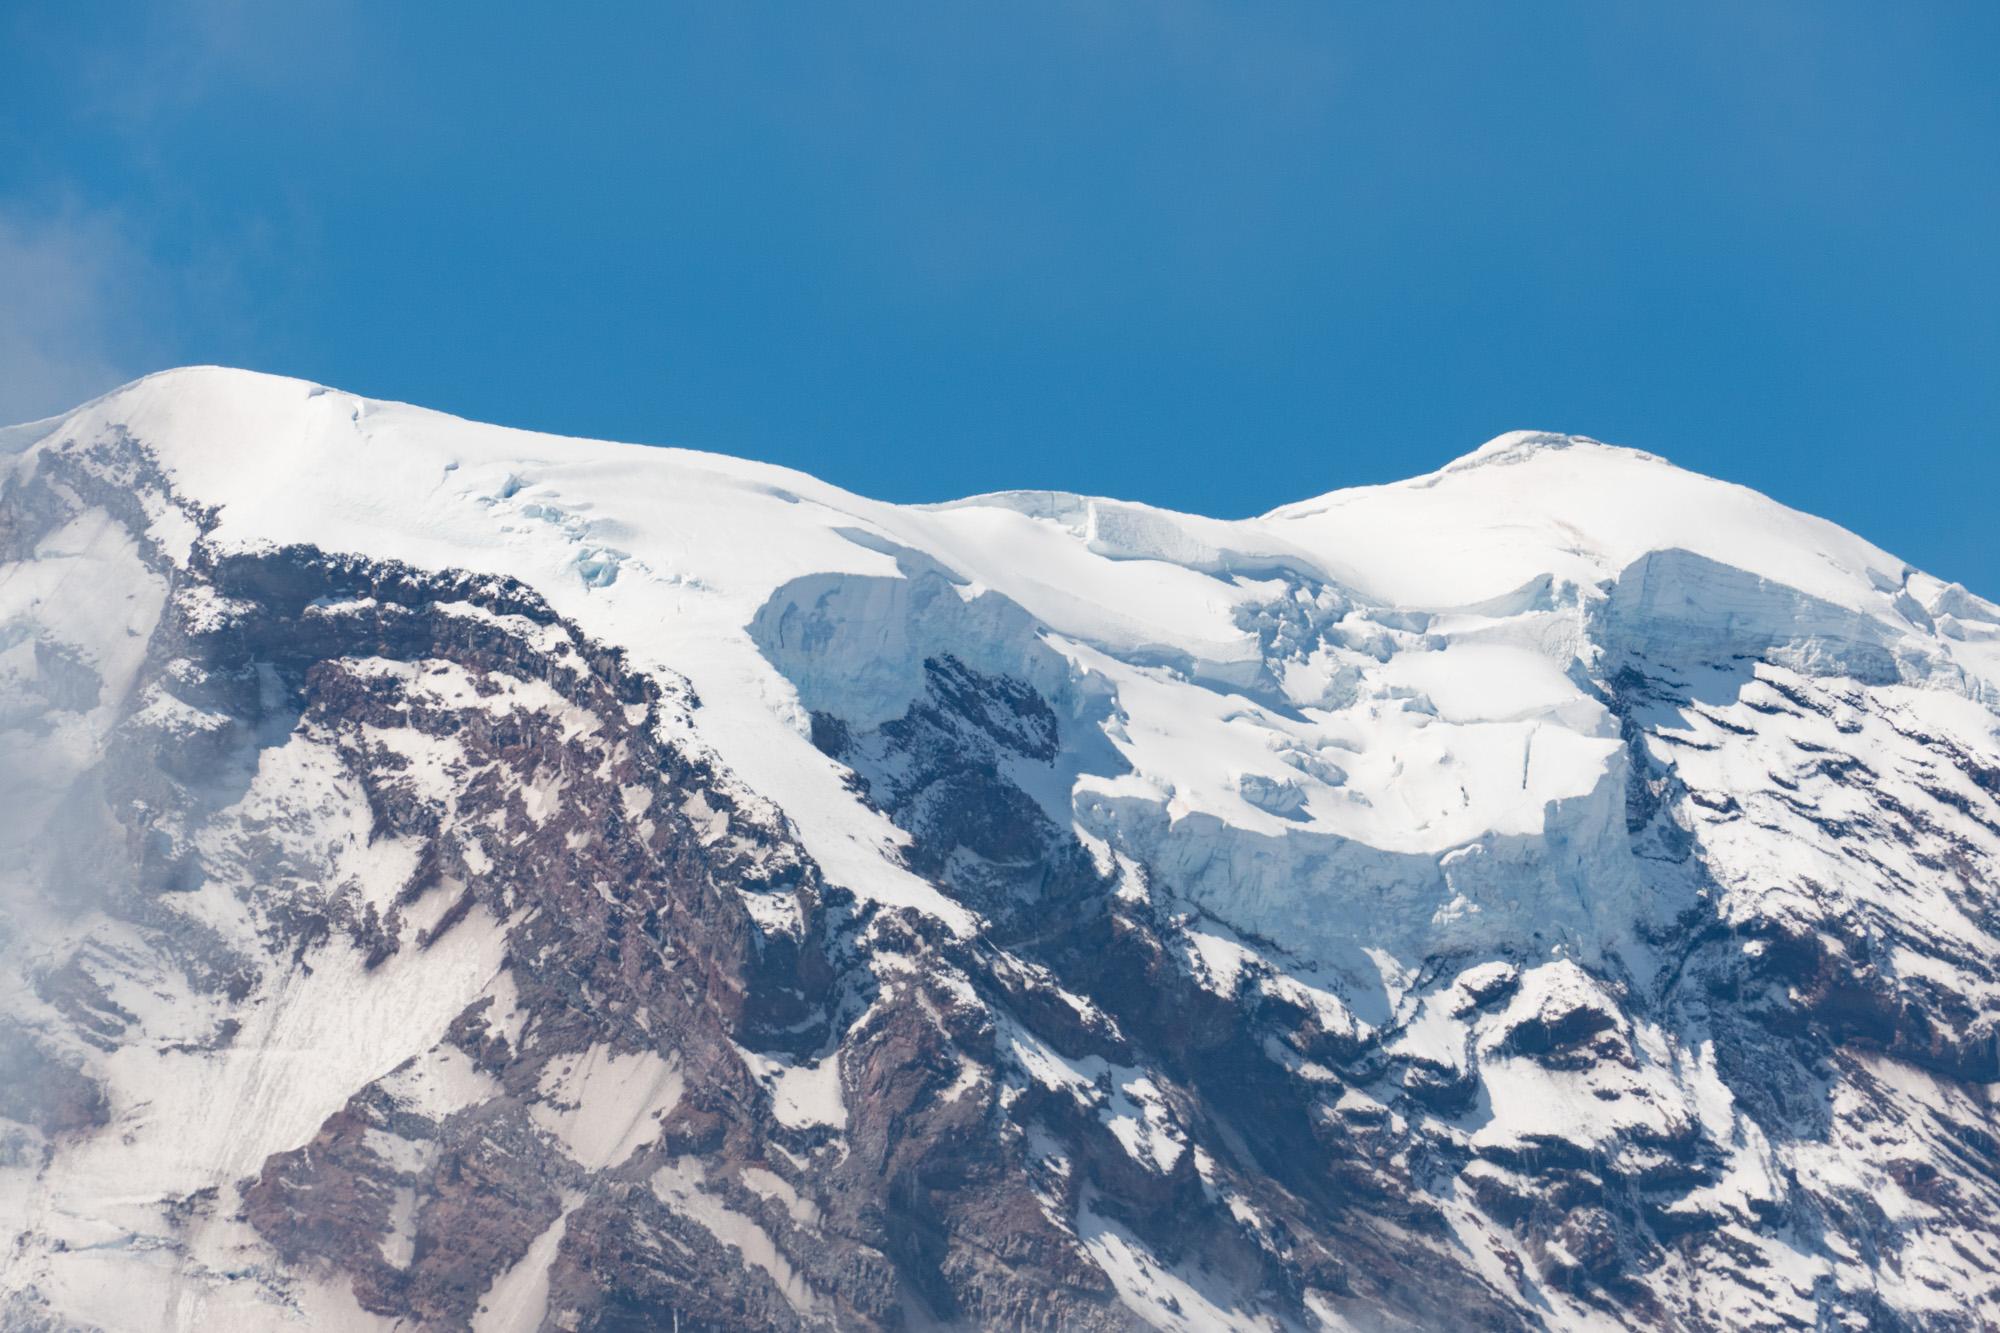 Glaciers at the peak